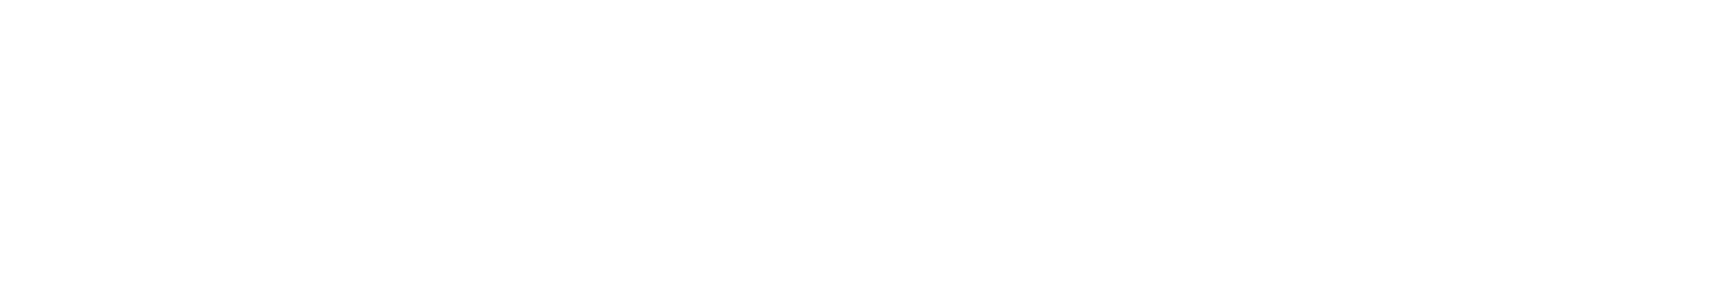 BrandedAcco-1